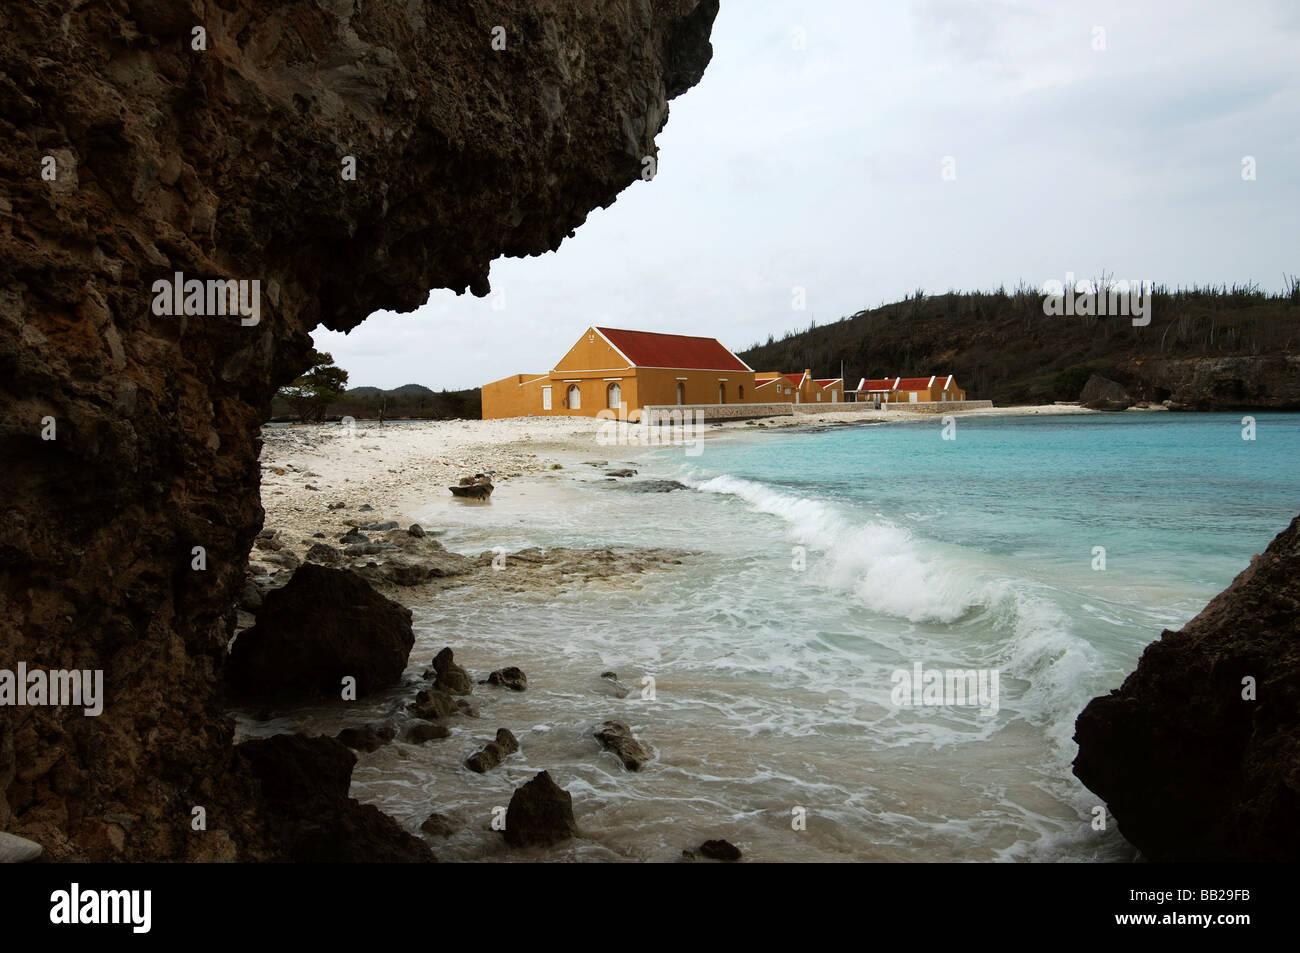 Netherlands Antilles Bonaire Boka Slagbaai of the Washington Slagbaai National Park - Stock Image